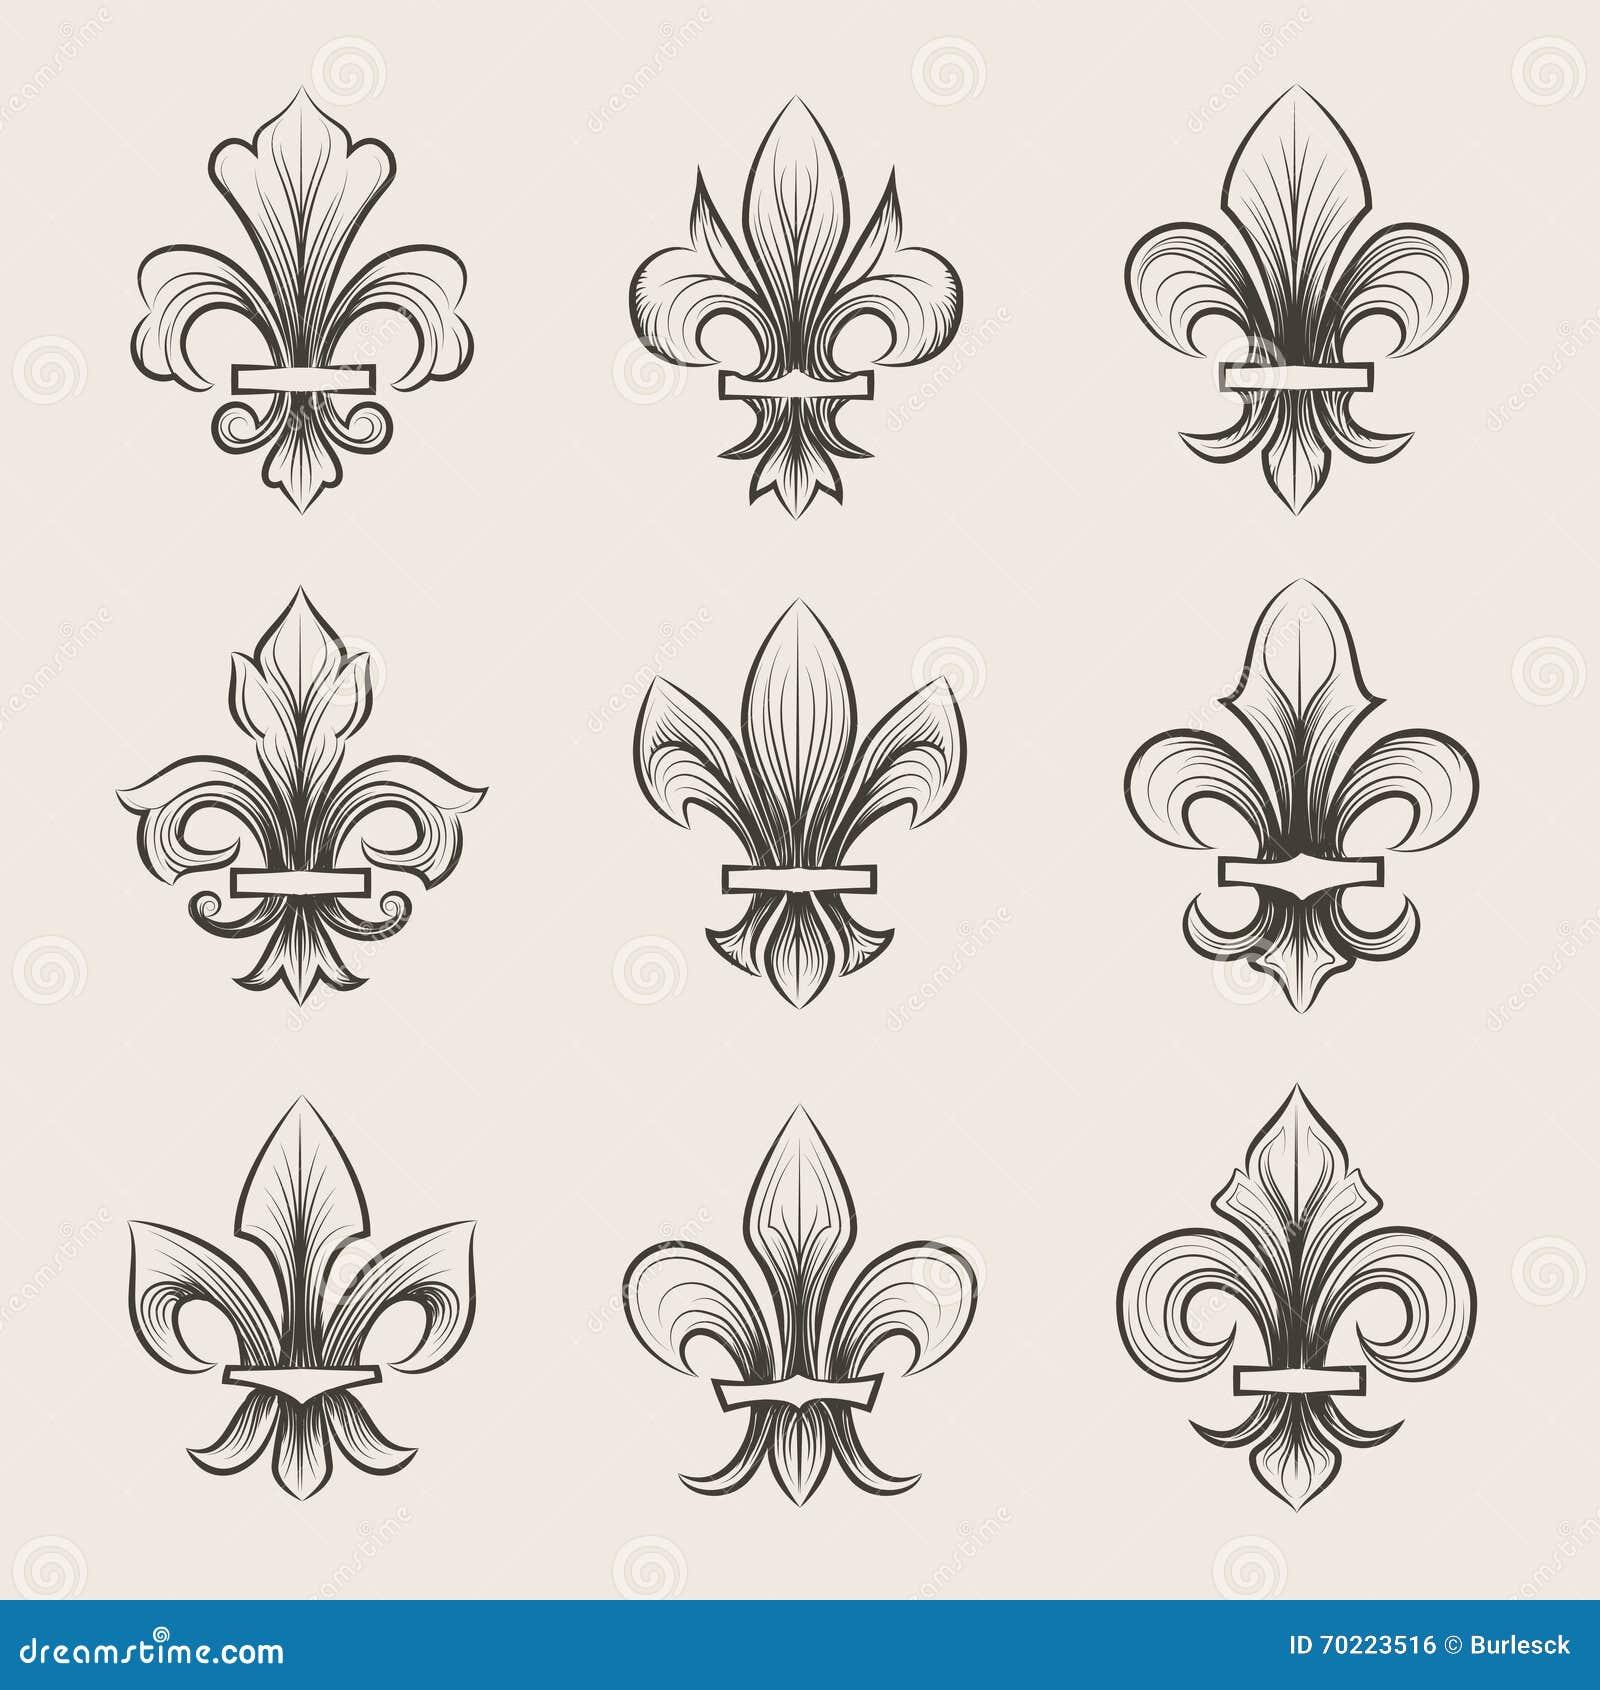 Engraving Fleur De Lis Icons Set Stock Vector  Image